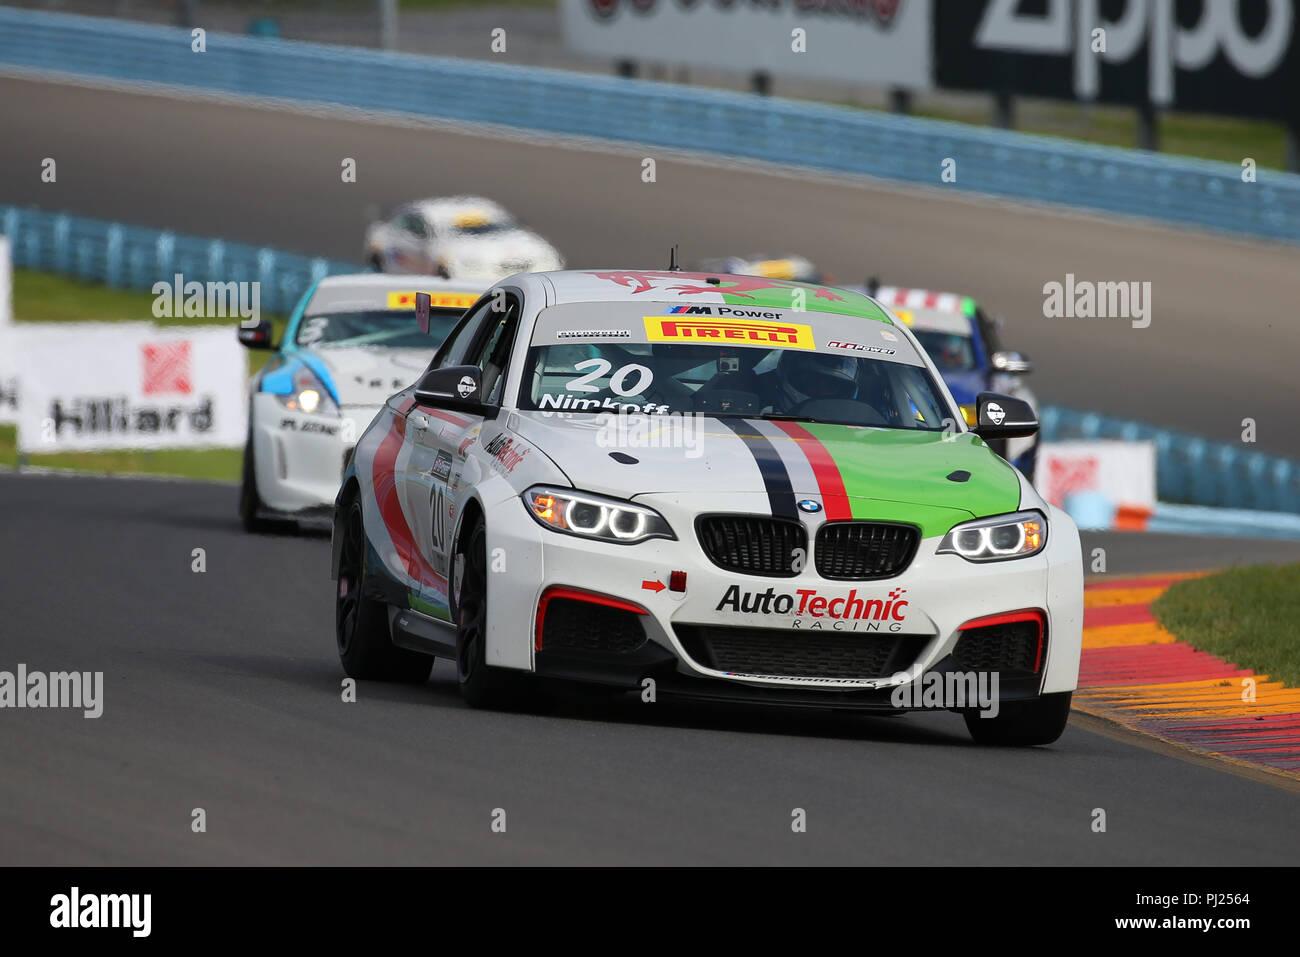 September 2 2018 Autotechnic Racing Driver Robert Nimkoff 20